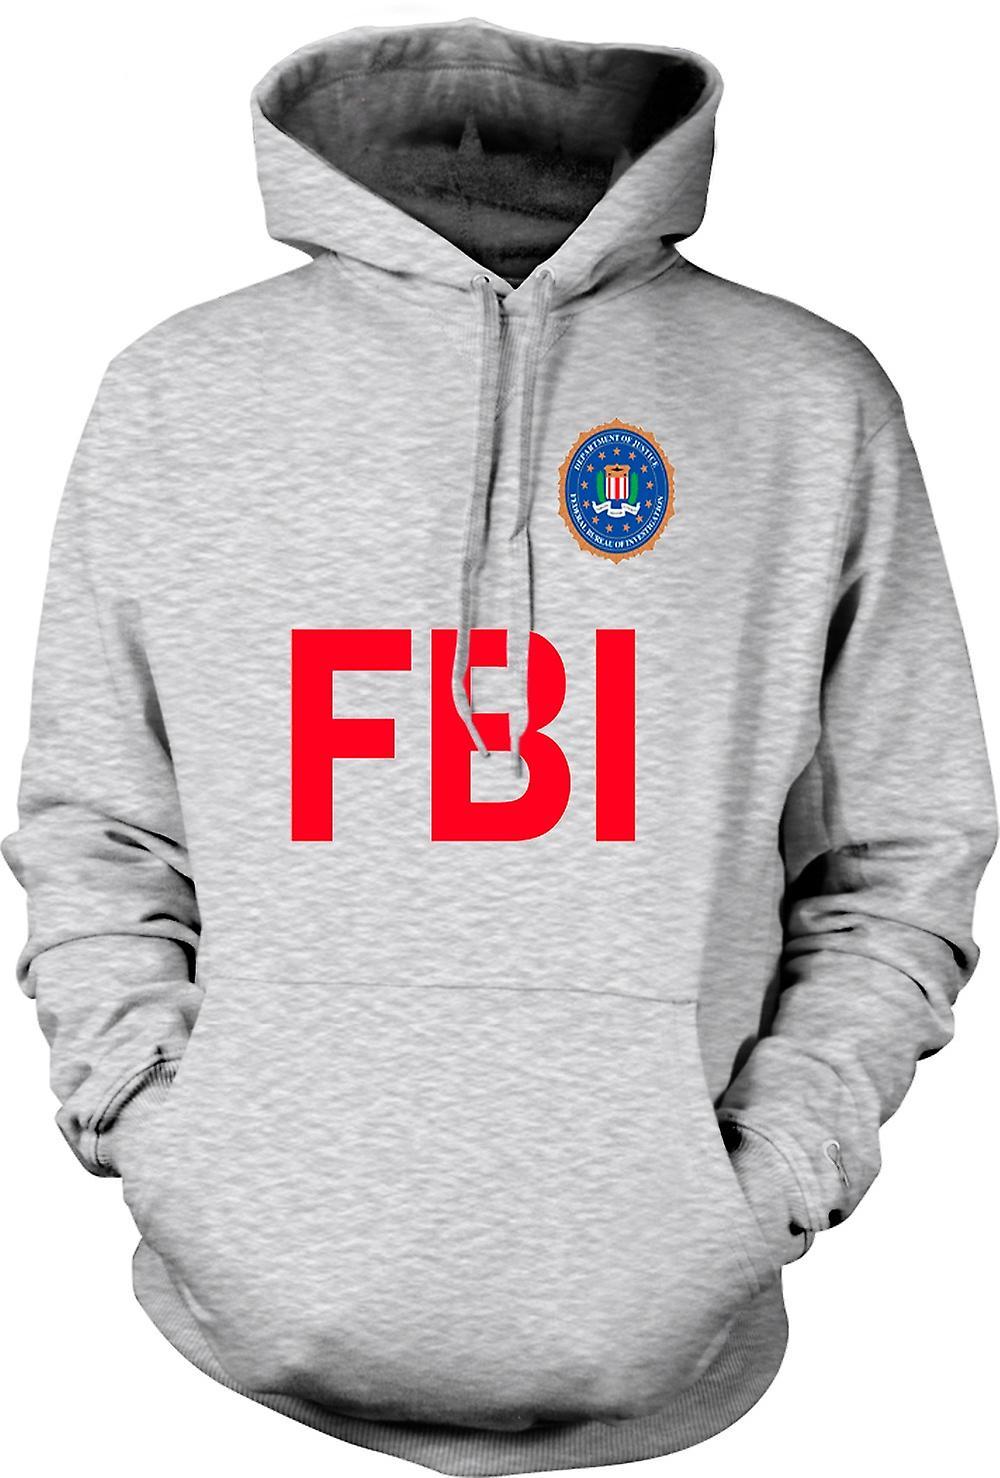 Mens Hoodie - FBI USA - polisen